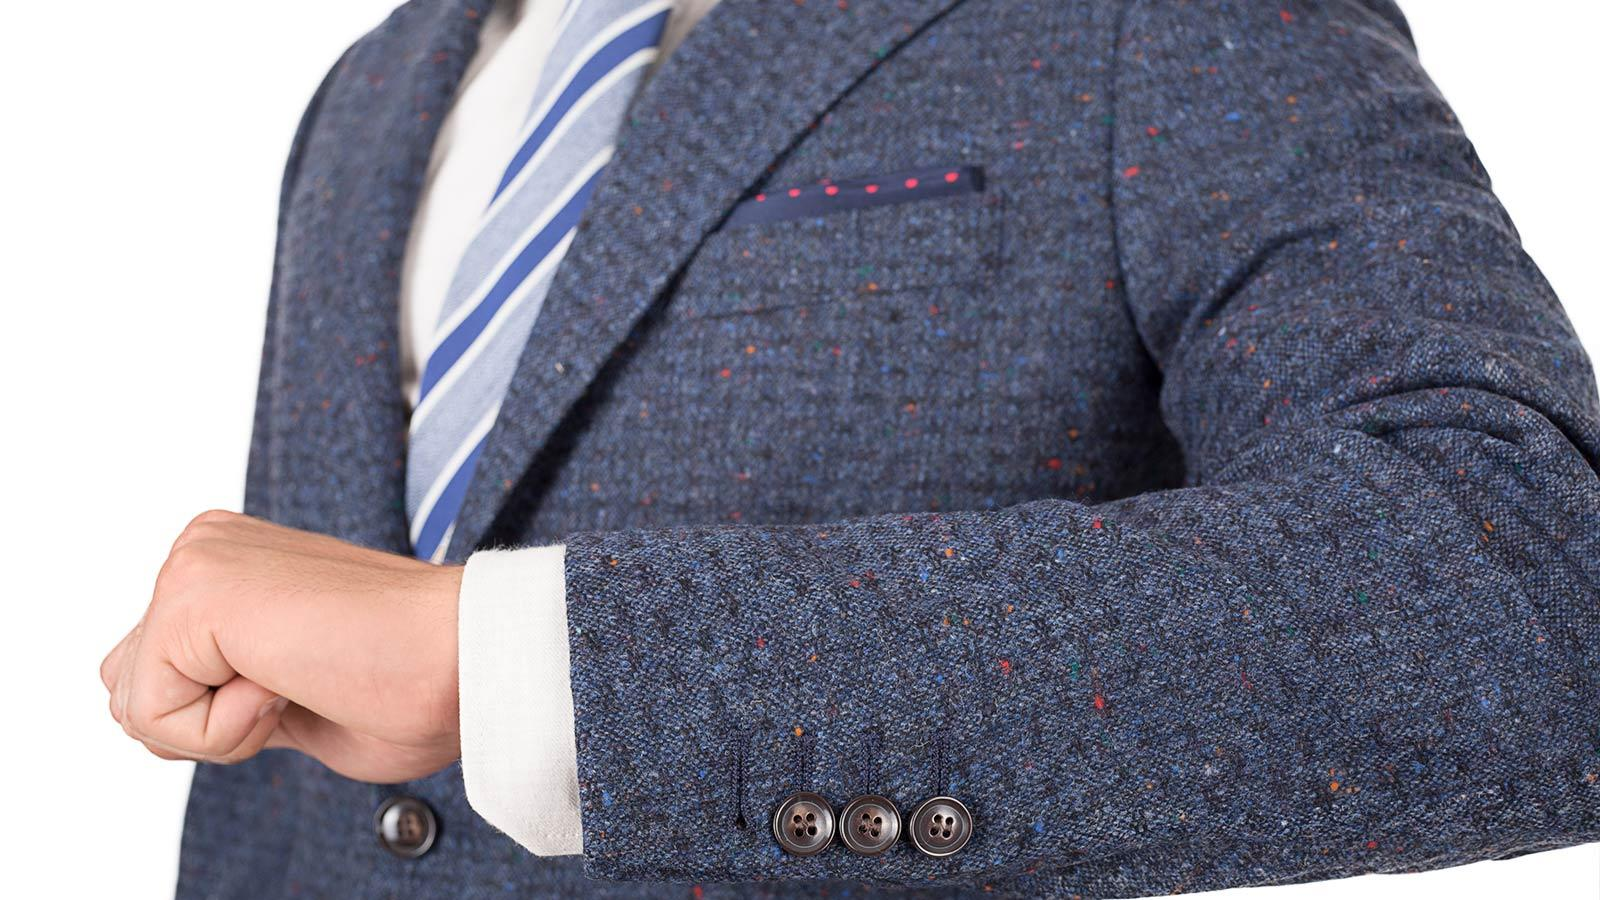 Blue Donegal Shadow Tweed Suit - slider image 1